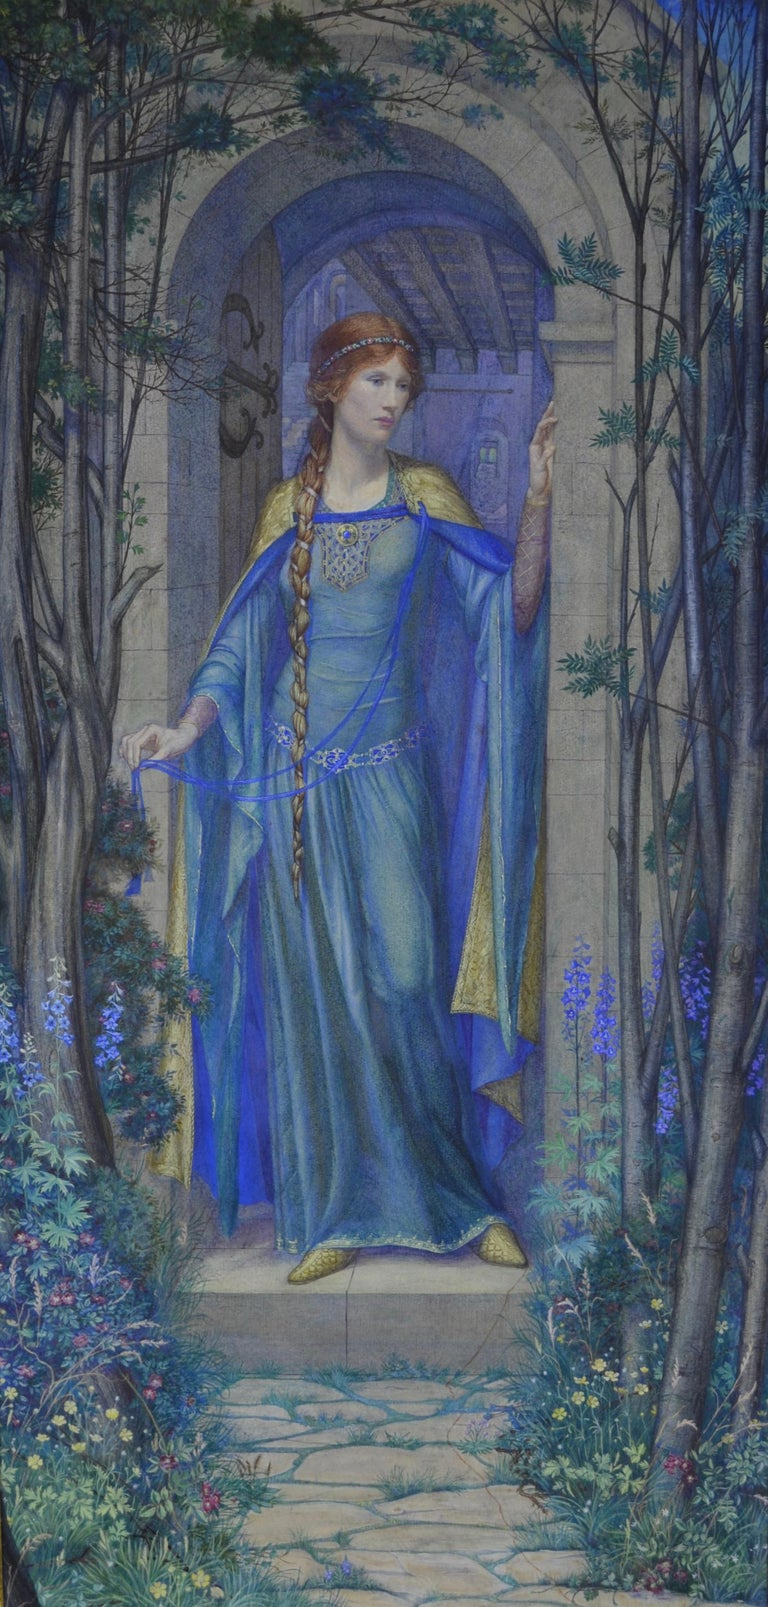 Kate Eadie, RMS Figurative Art - Fair Rosamond - Pre-Raphaelite watercolour by British Female Artist Kate Eadie